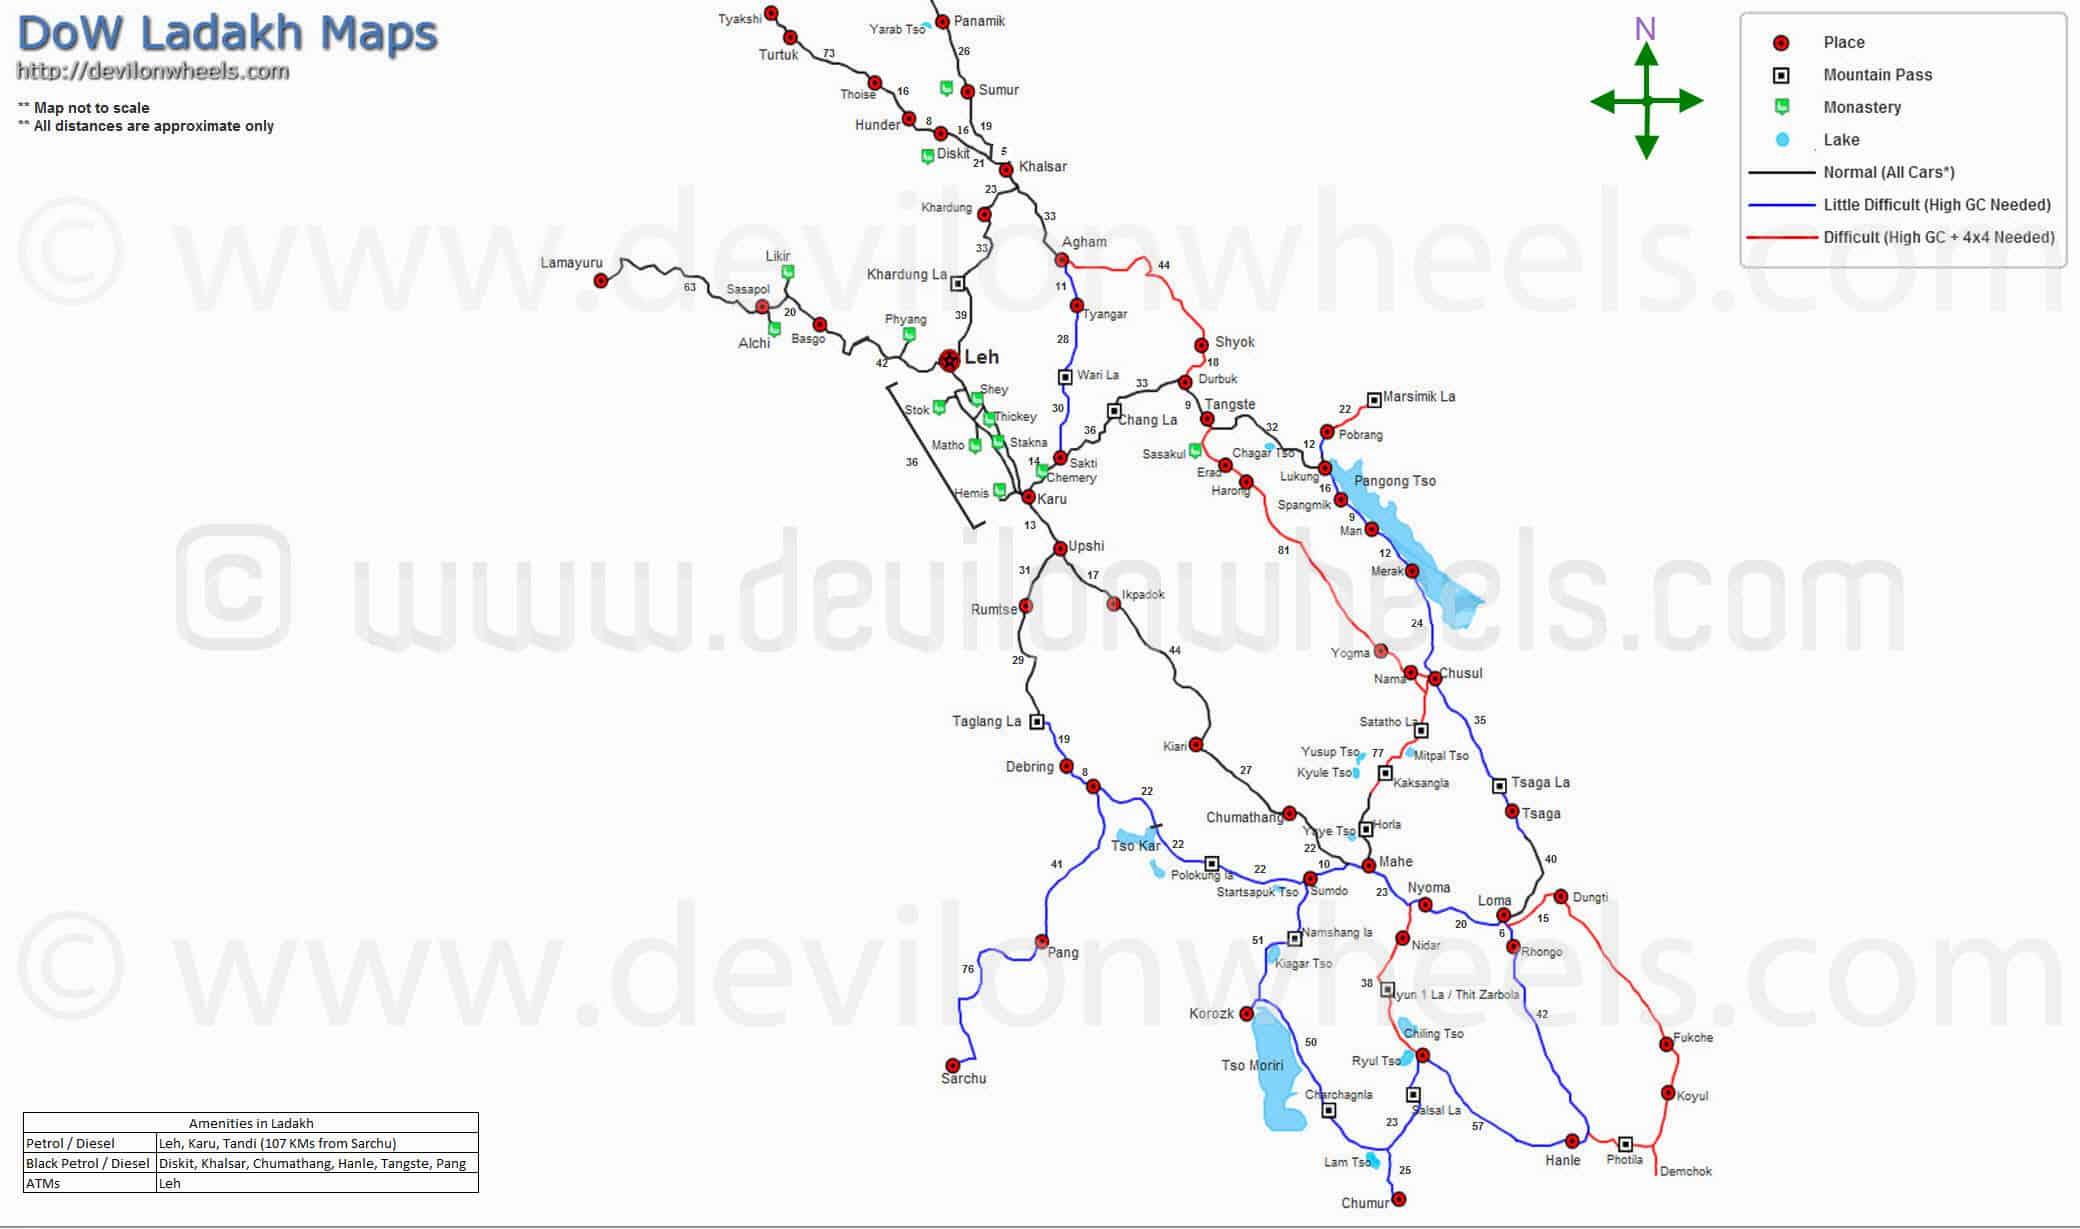 DoW - Maps of Ladakh